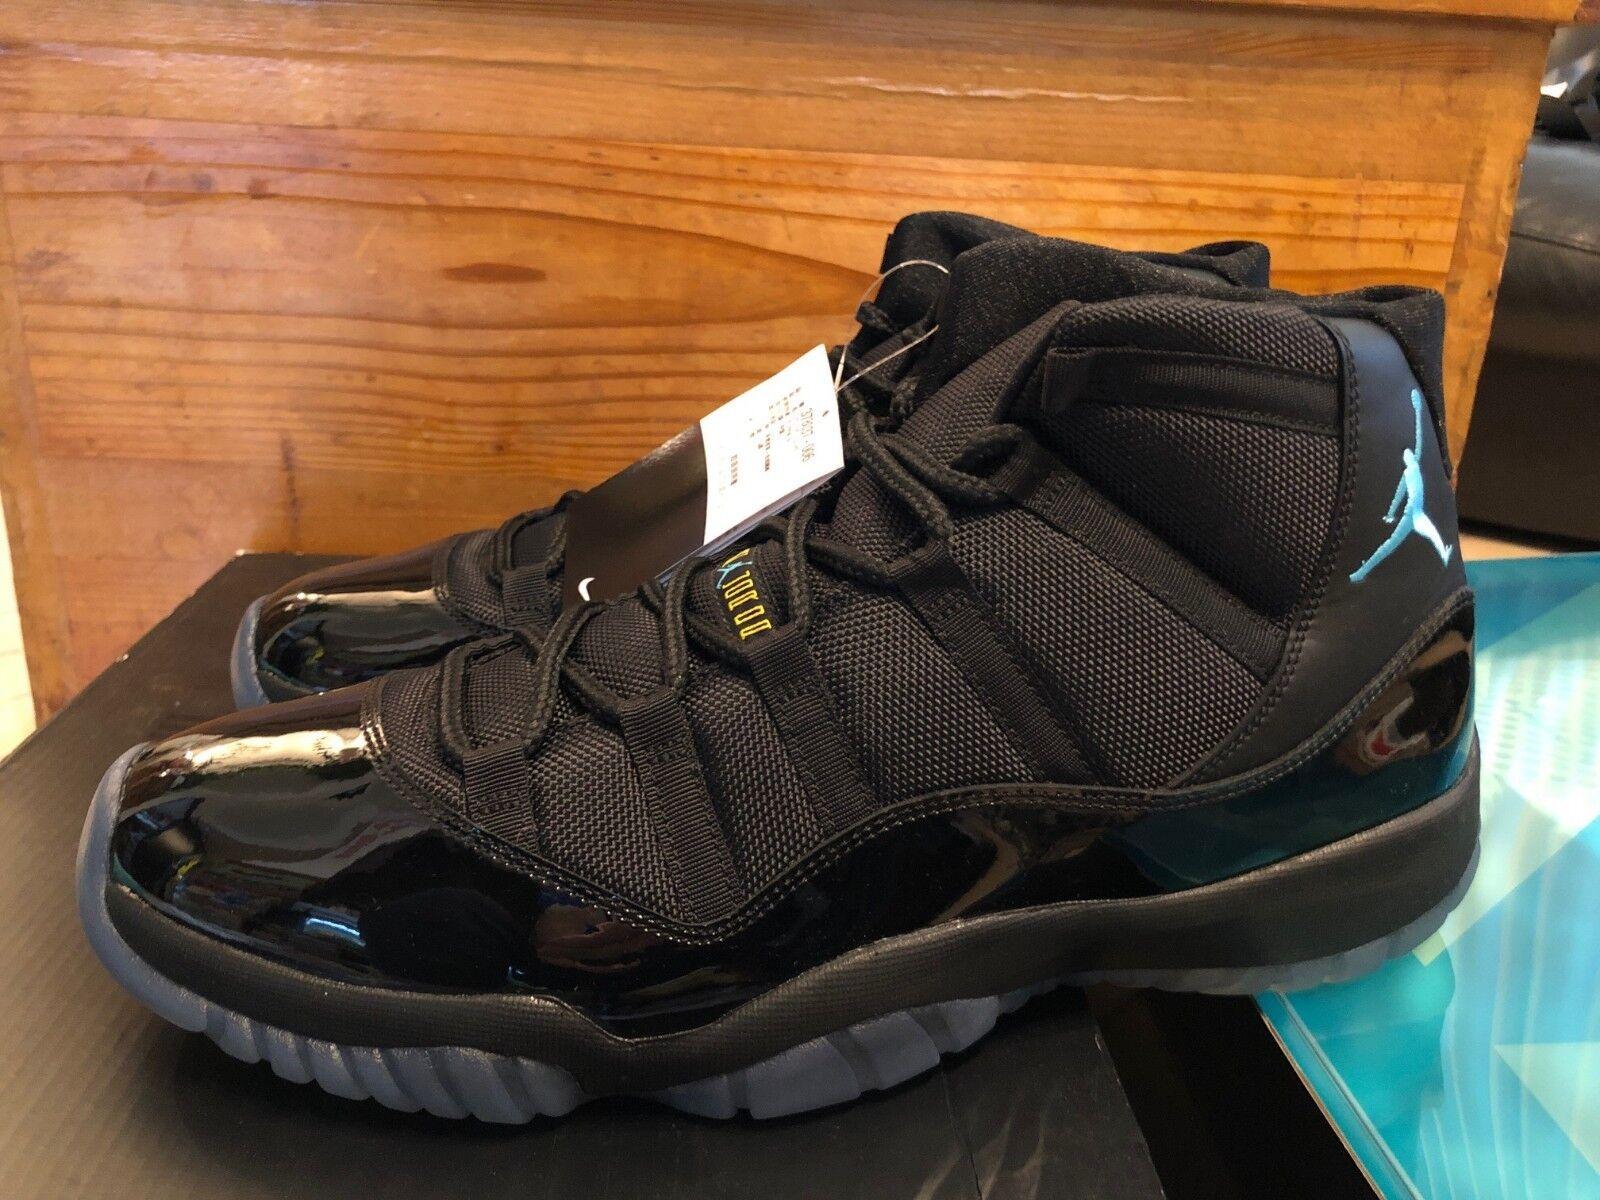 2013 Nike Air Jordan XI 11 Retro Gamma bluee Black patent size 14